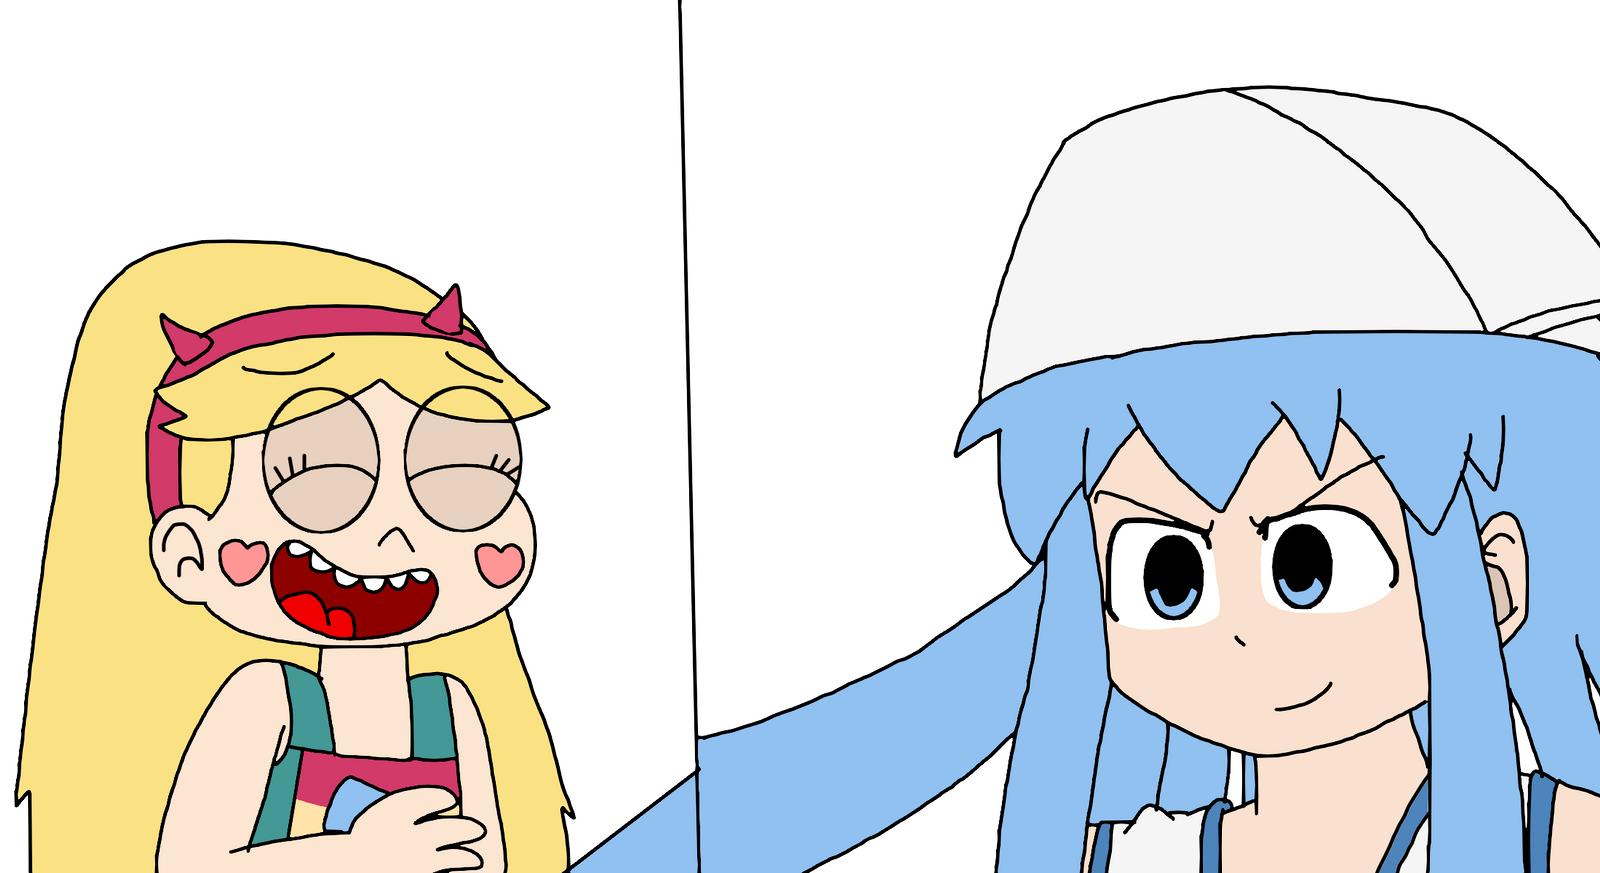 how to draw anime girl feet